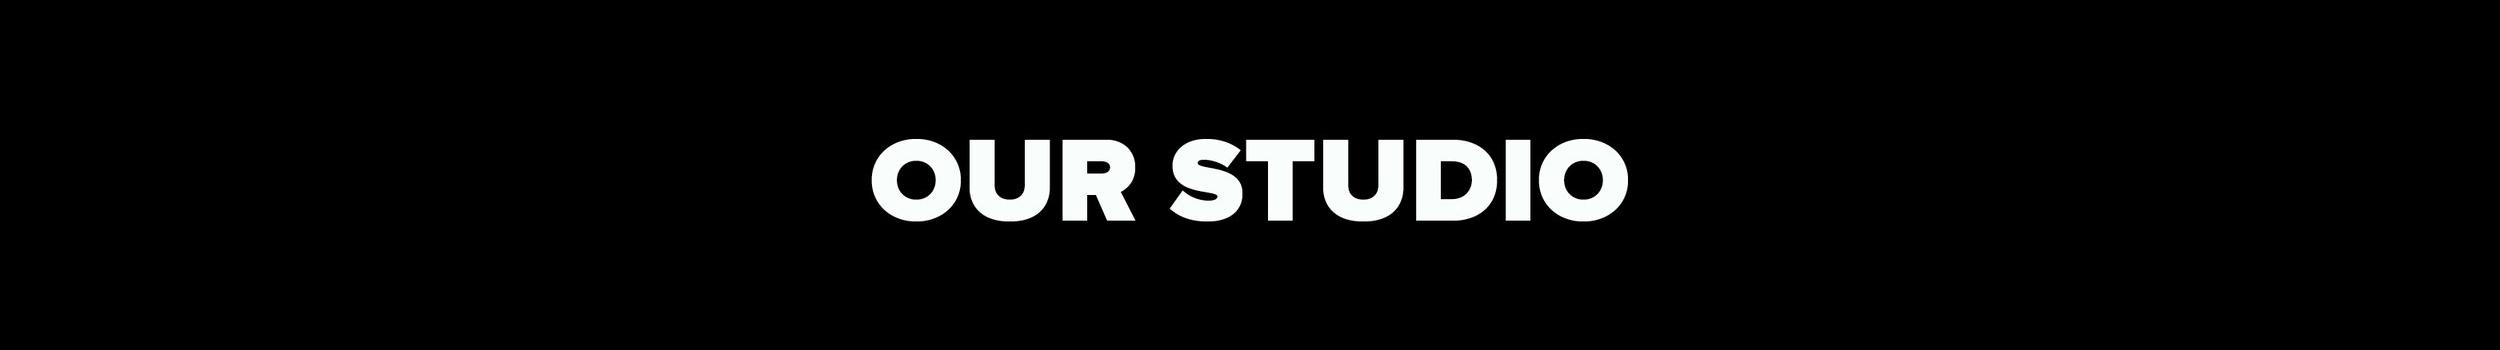 Where's your studio located?